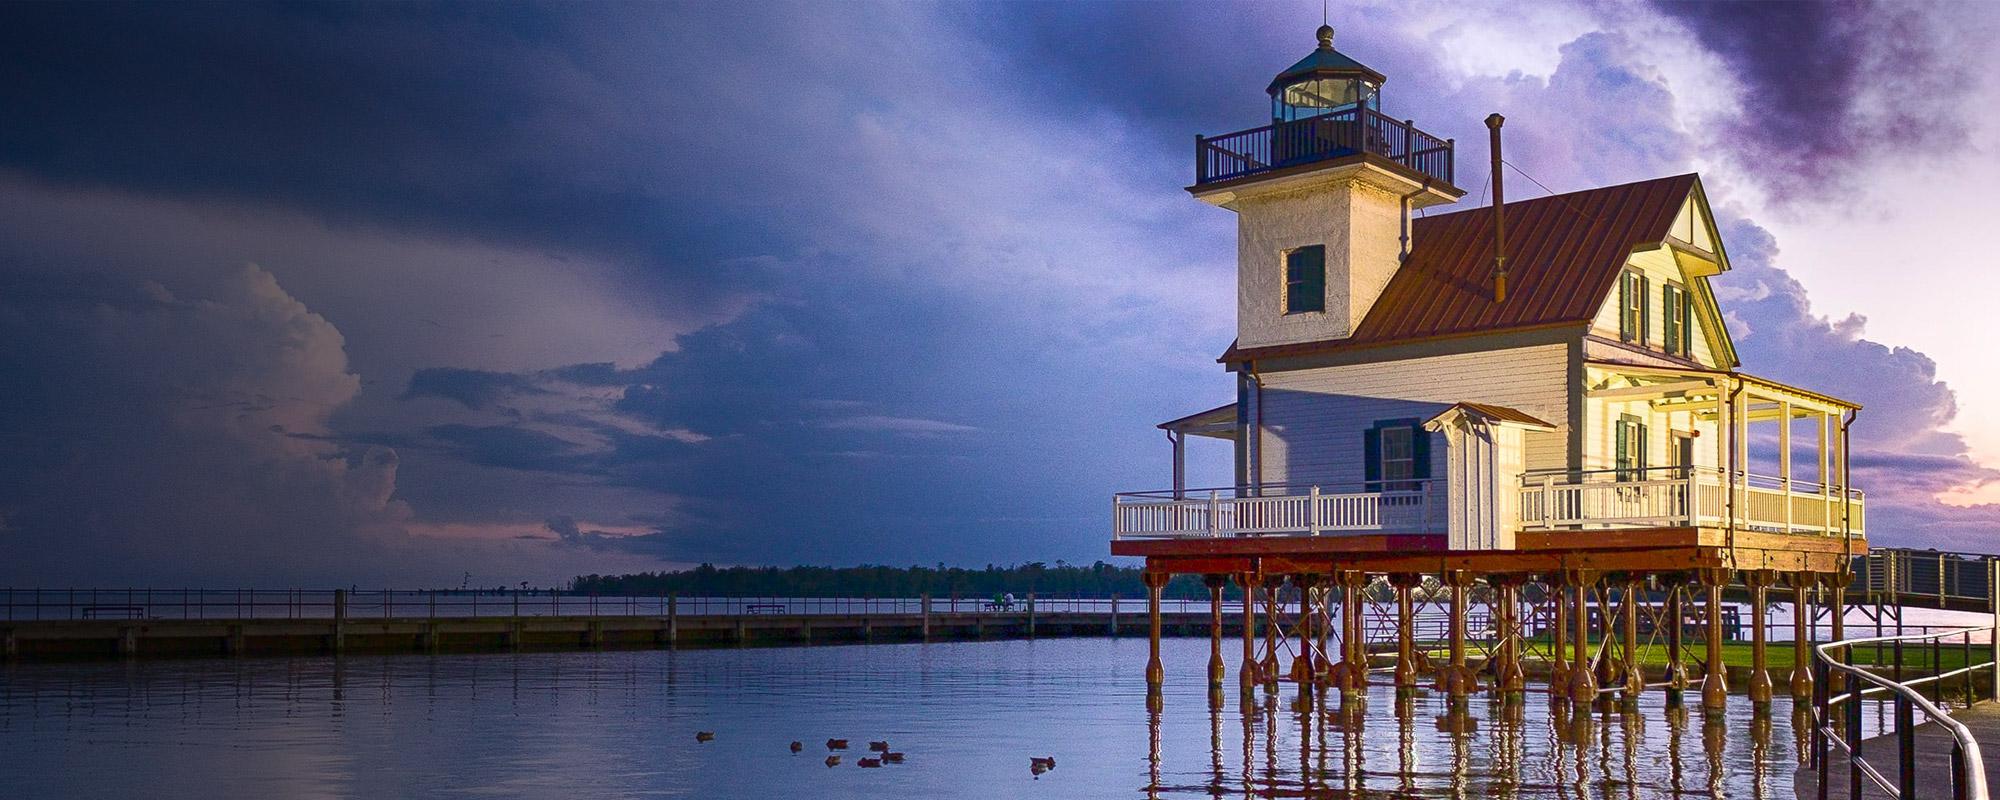 historic waterfront edenton nc